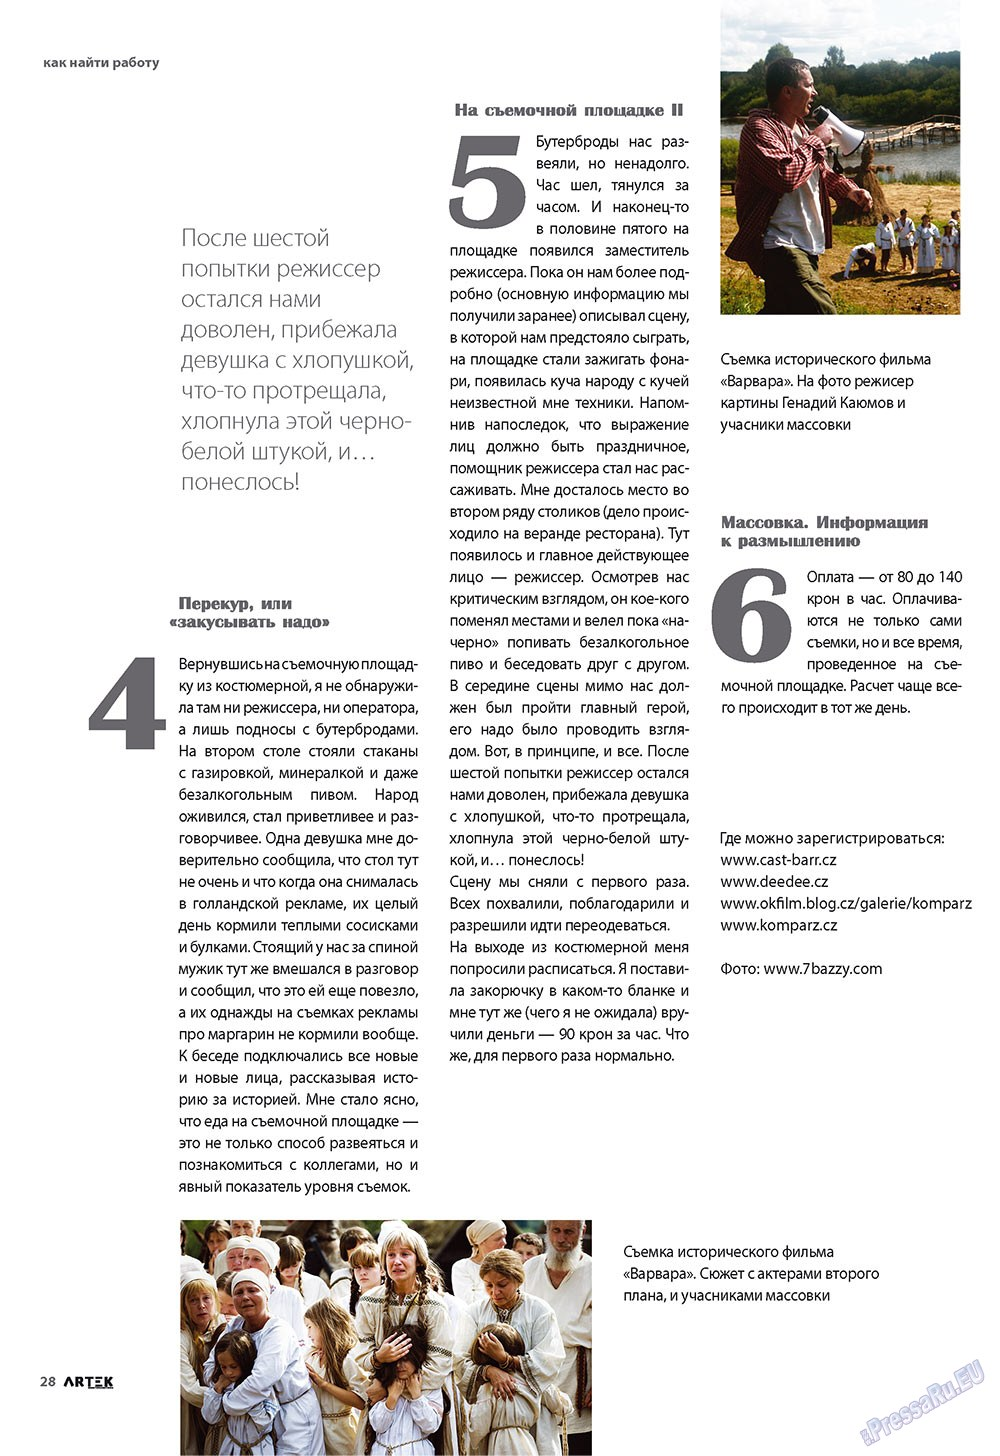 Артек (журнал). 2009 год, номер 4, стр. 28